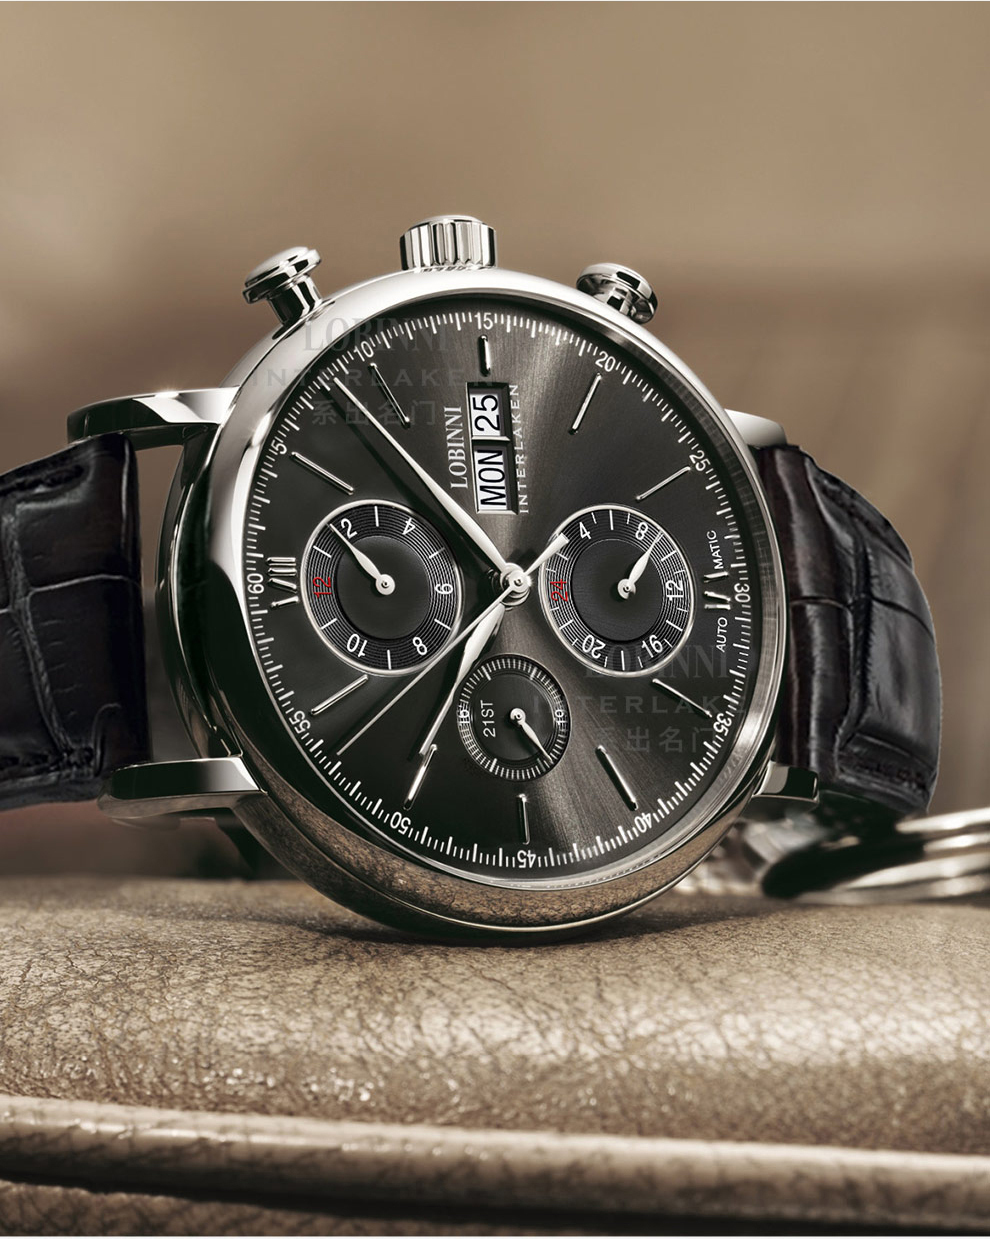 HTB1bhO9VbvpK1RjSZFqq6AXUVXa4 Switzerland LOBINNI Men Watches Luxury Brand Perpetual Calender Auto Mechanical Men's Clock Sapphire Leather relogio L13019-6